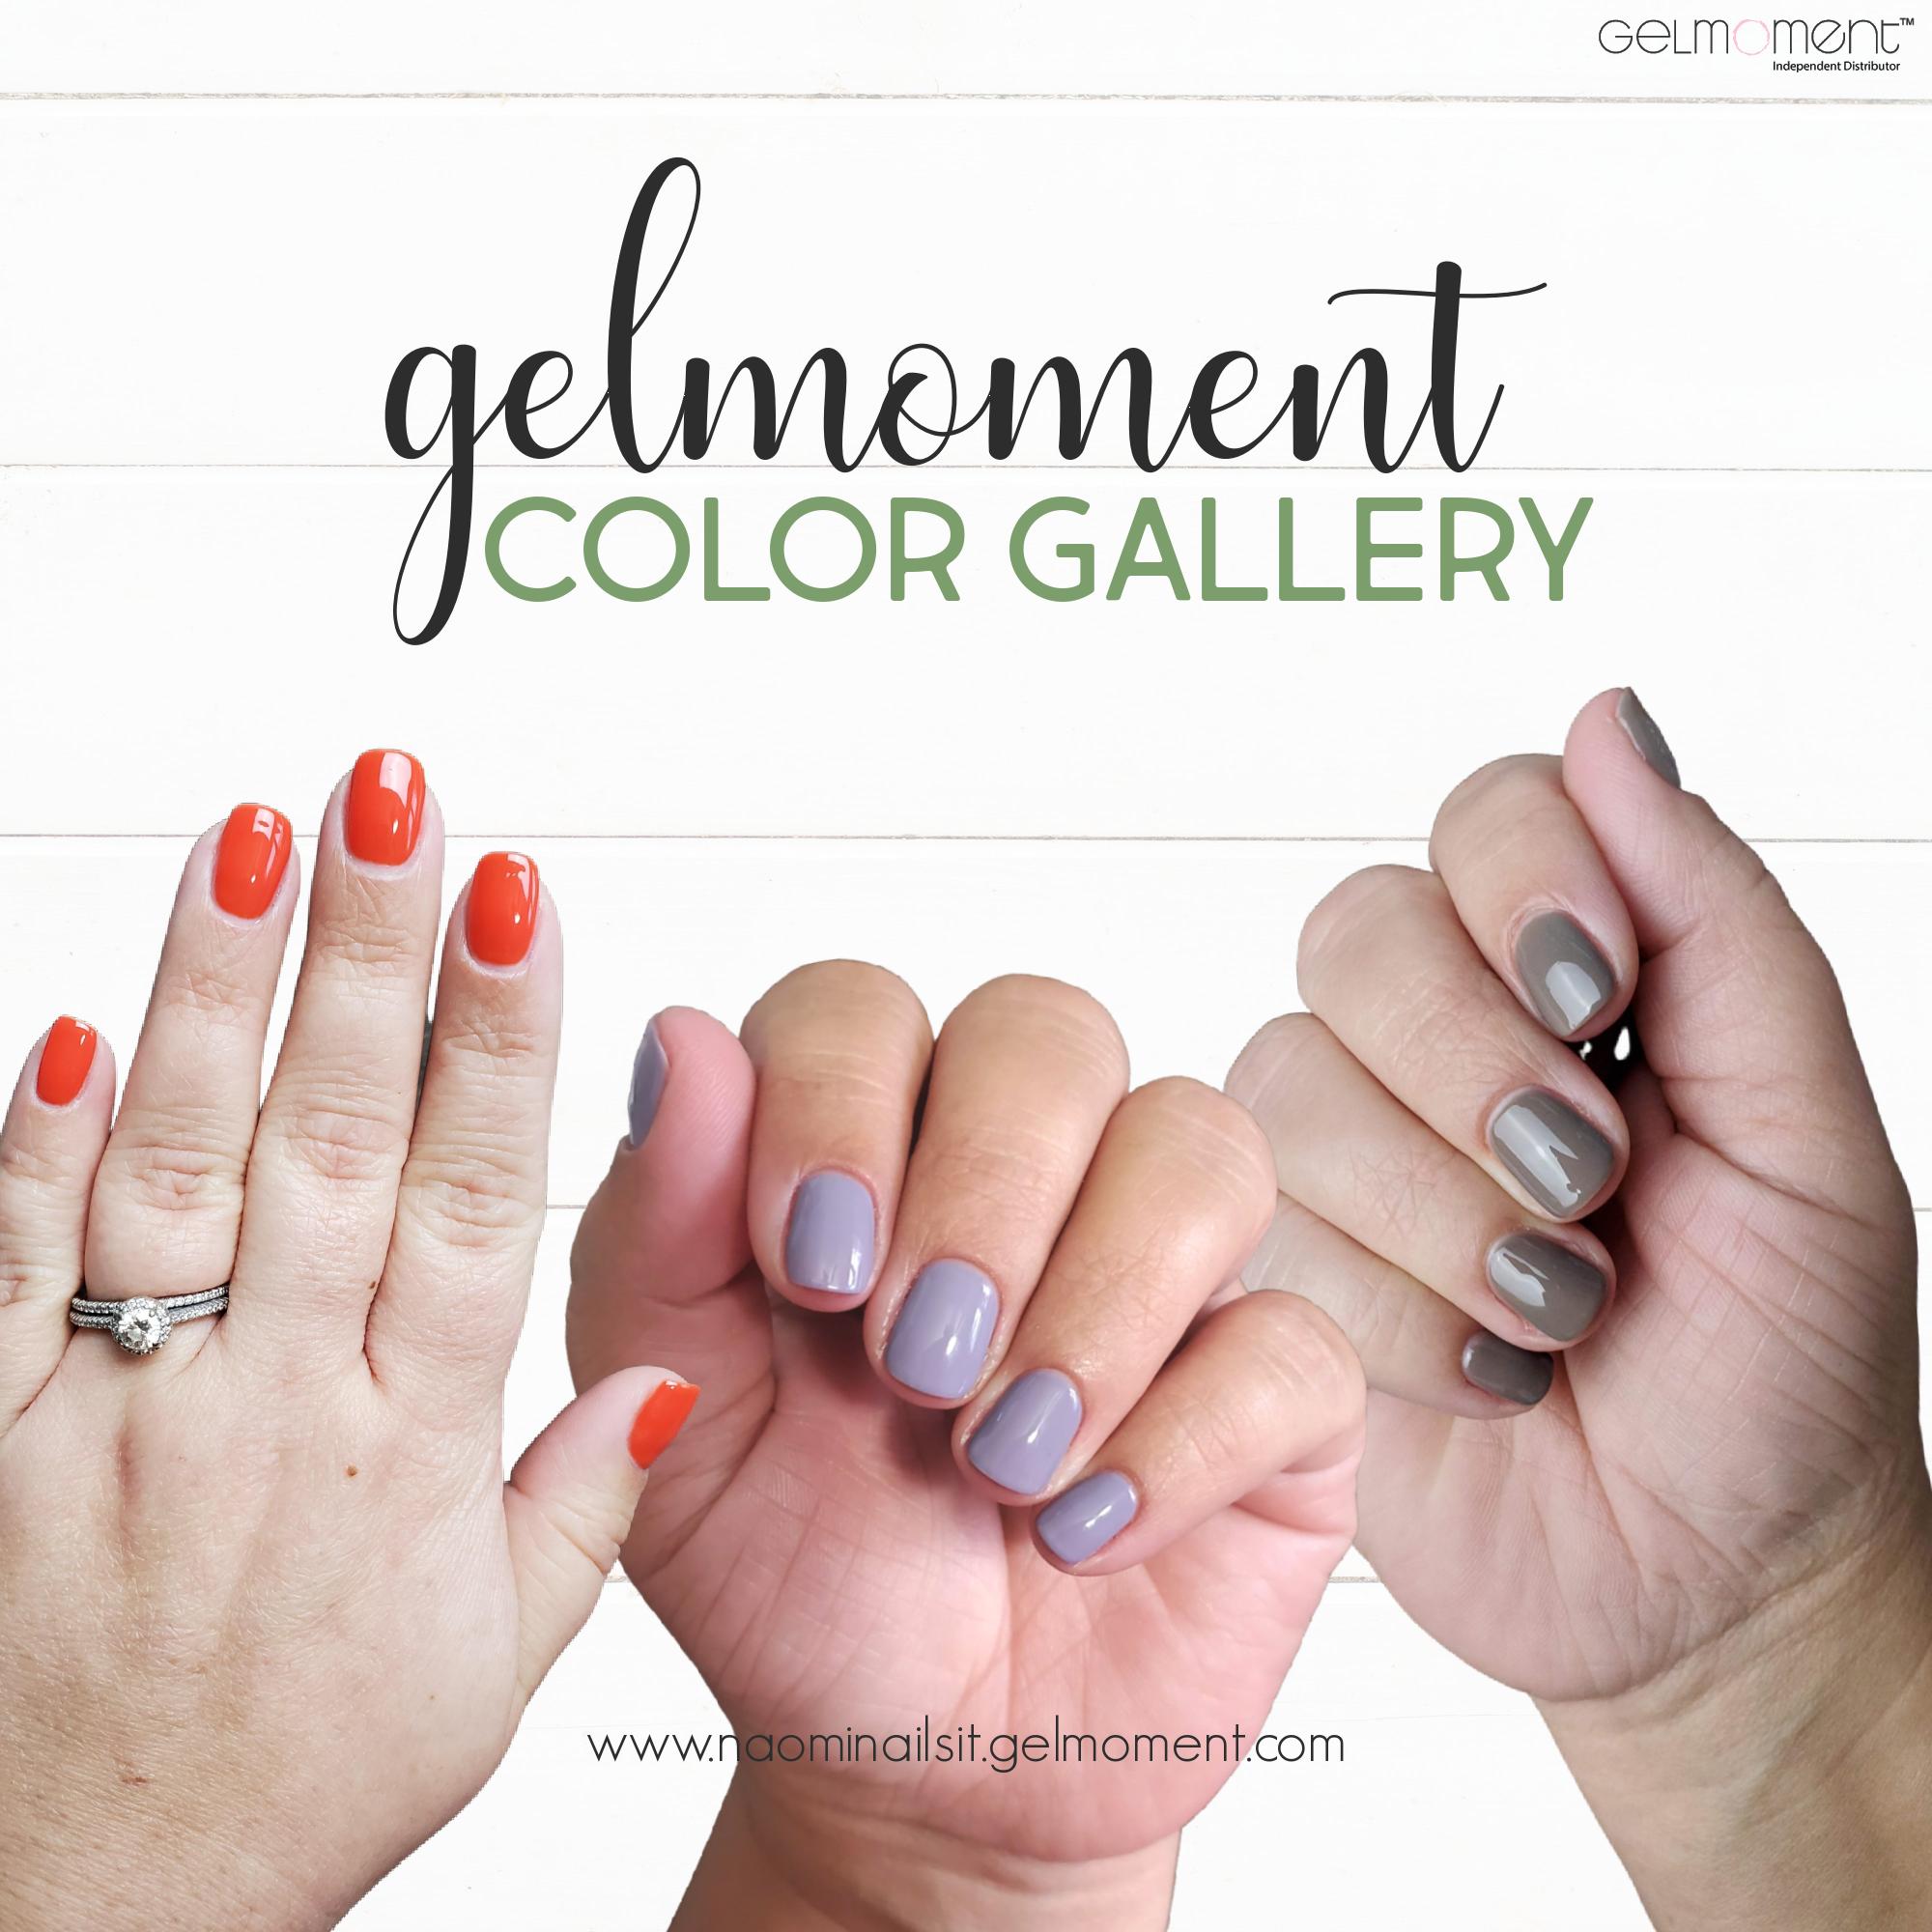 gelmoment colors, gelmoment color gallery, gelmoment, at home gel polish, gelmoment polish,